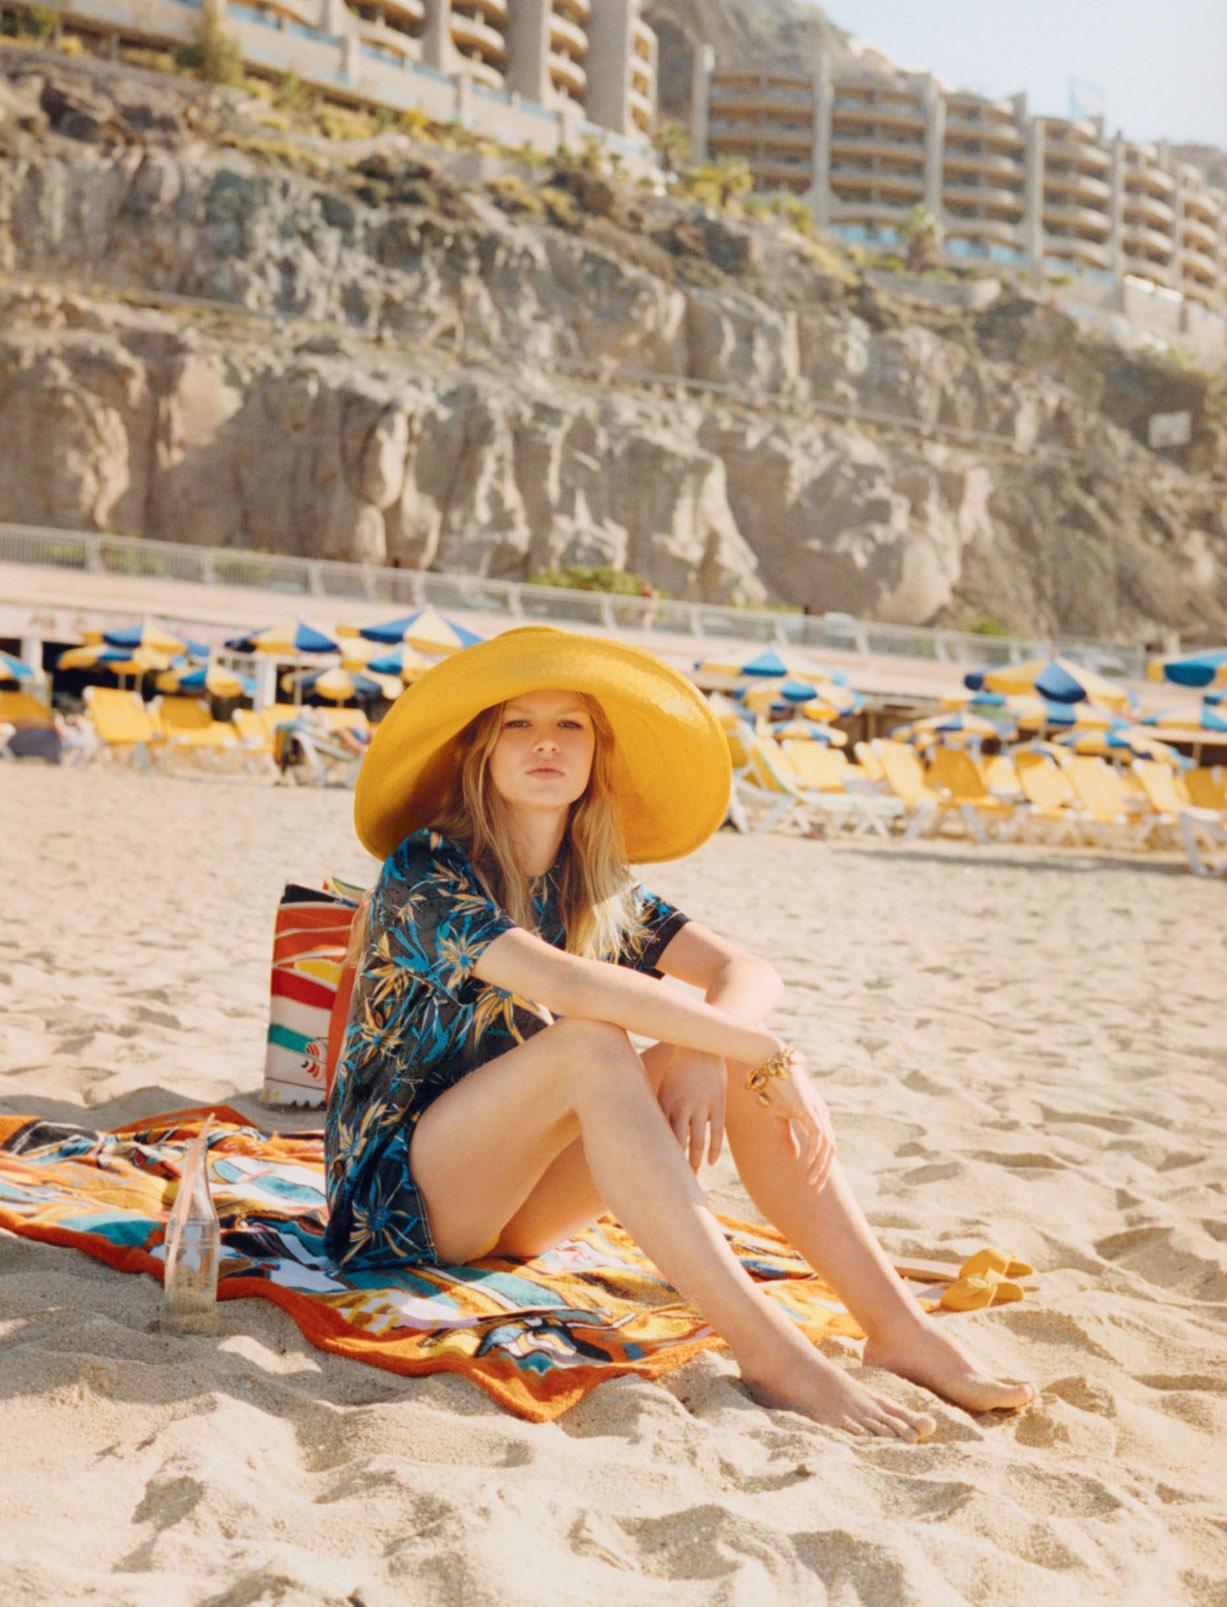 Один день на море с Анной Эверс / Anna Ewers by Venetia Scott - W Magazine may 2017